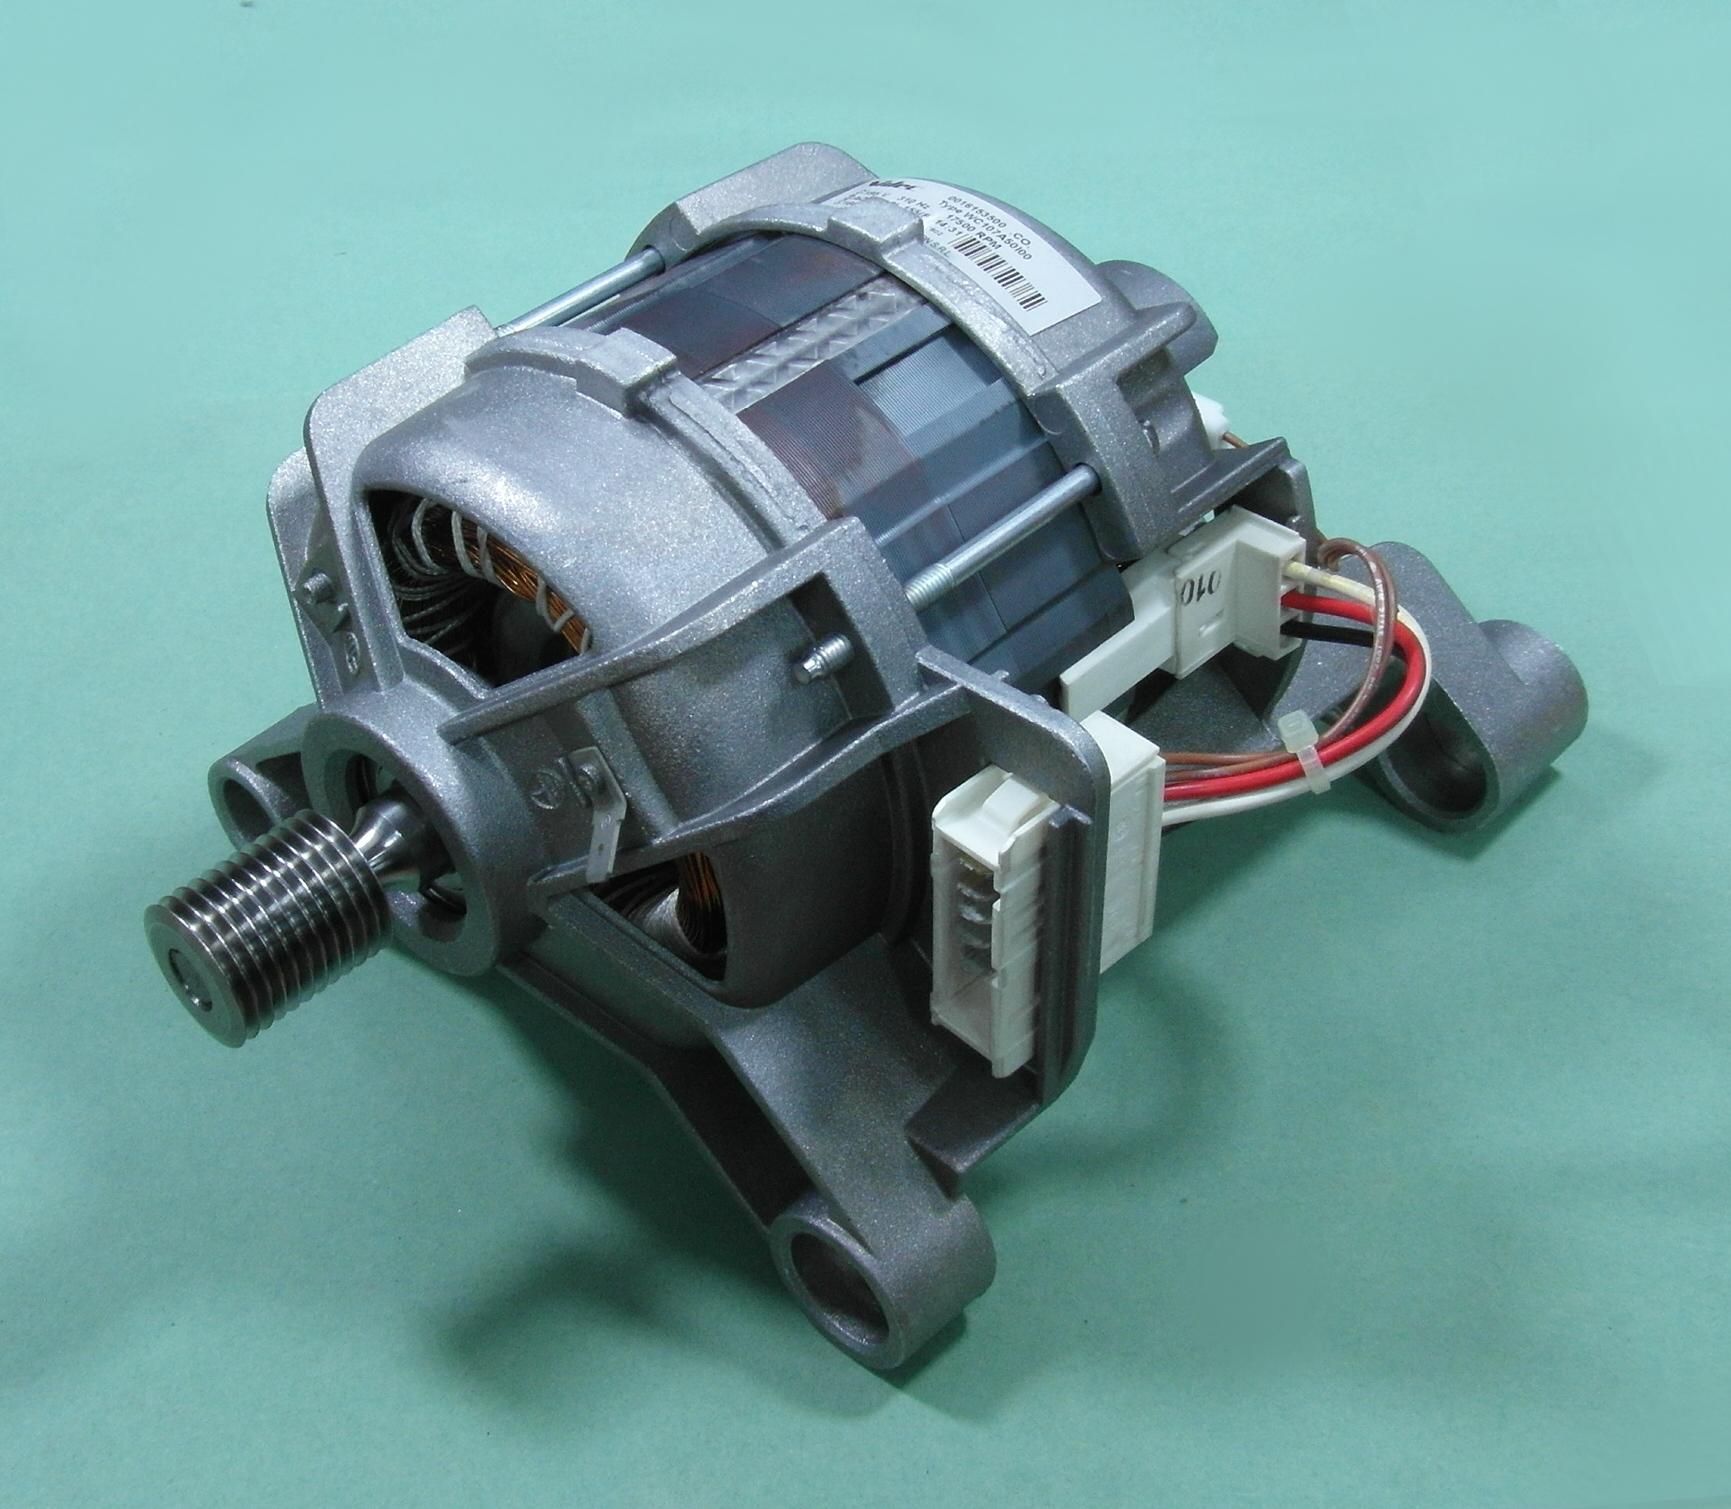 Hotpoint Wdl5290 Washer Dryer Motor Nidec Type Wc107a50i00